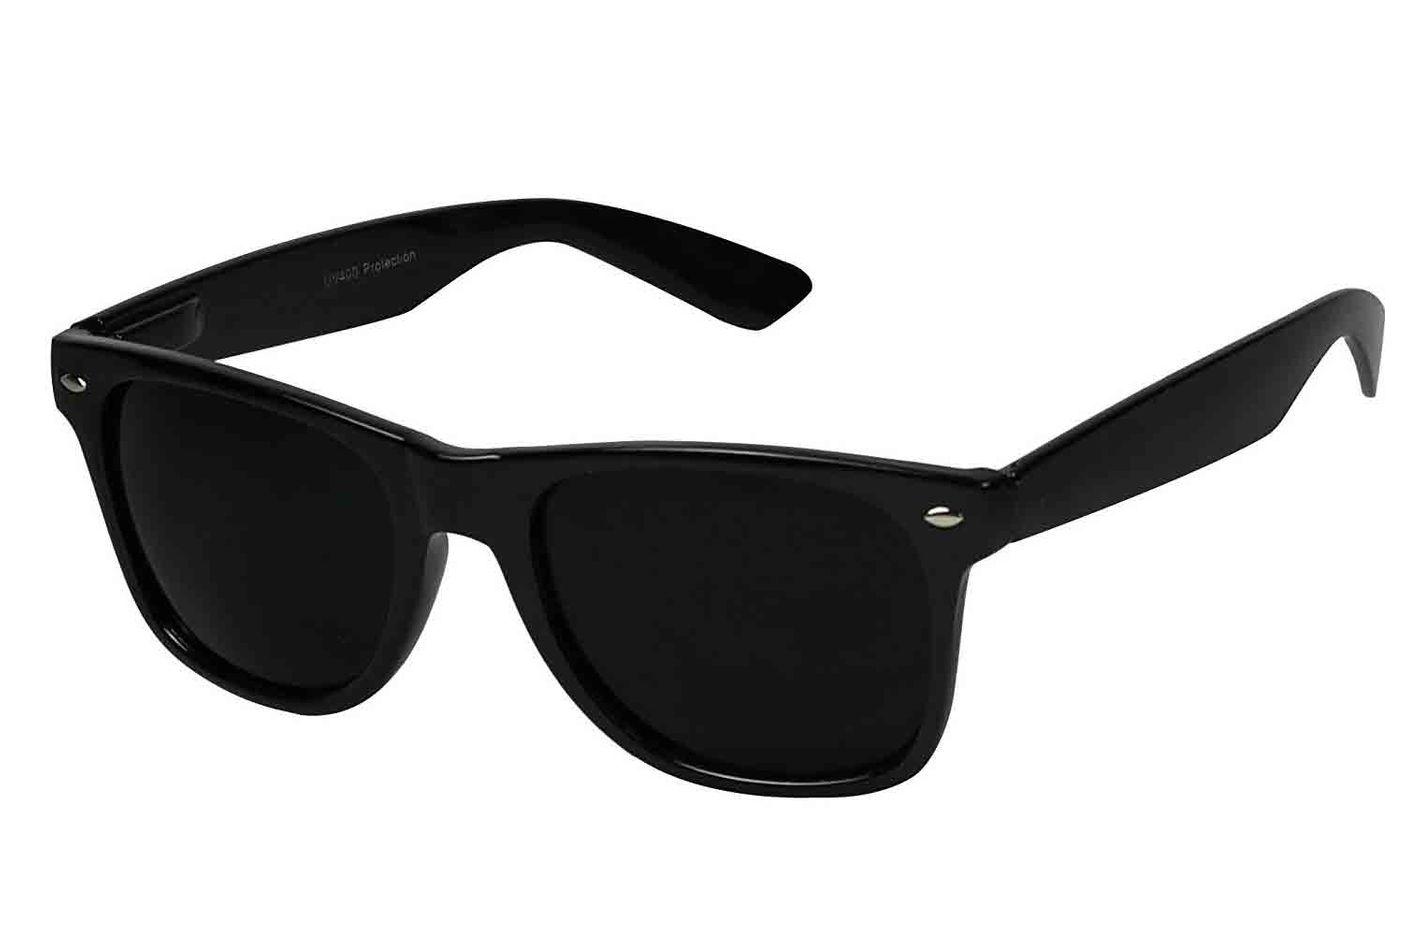 Basik Eyewear Sunglasses